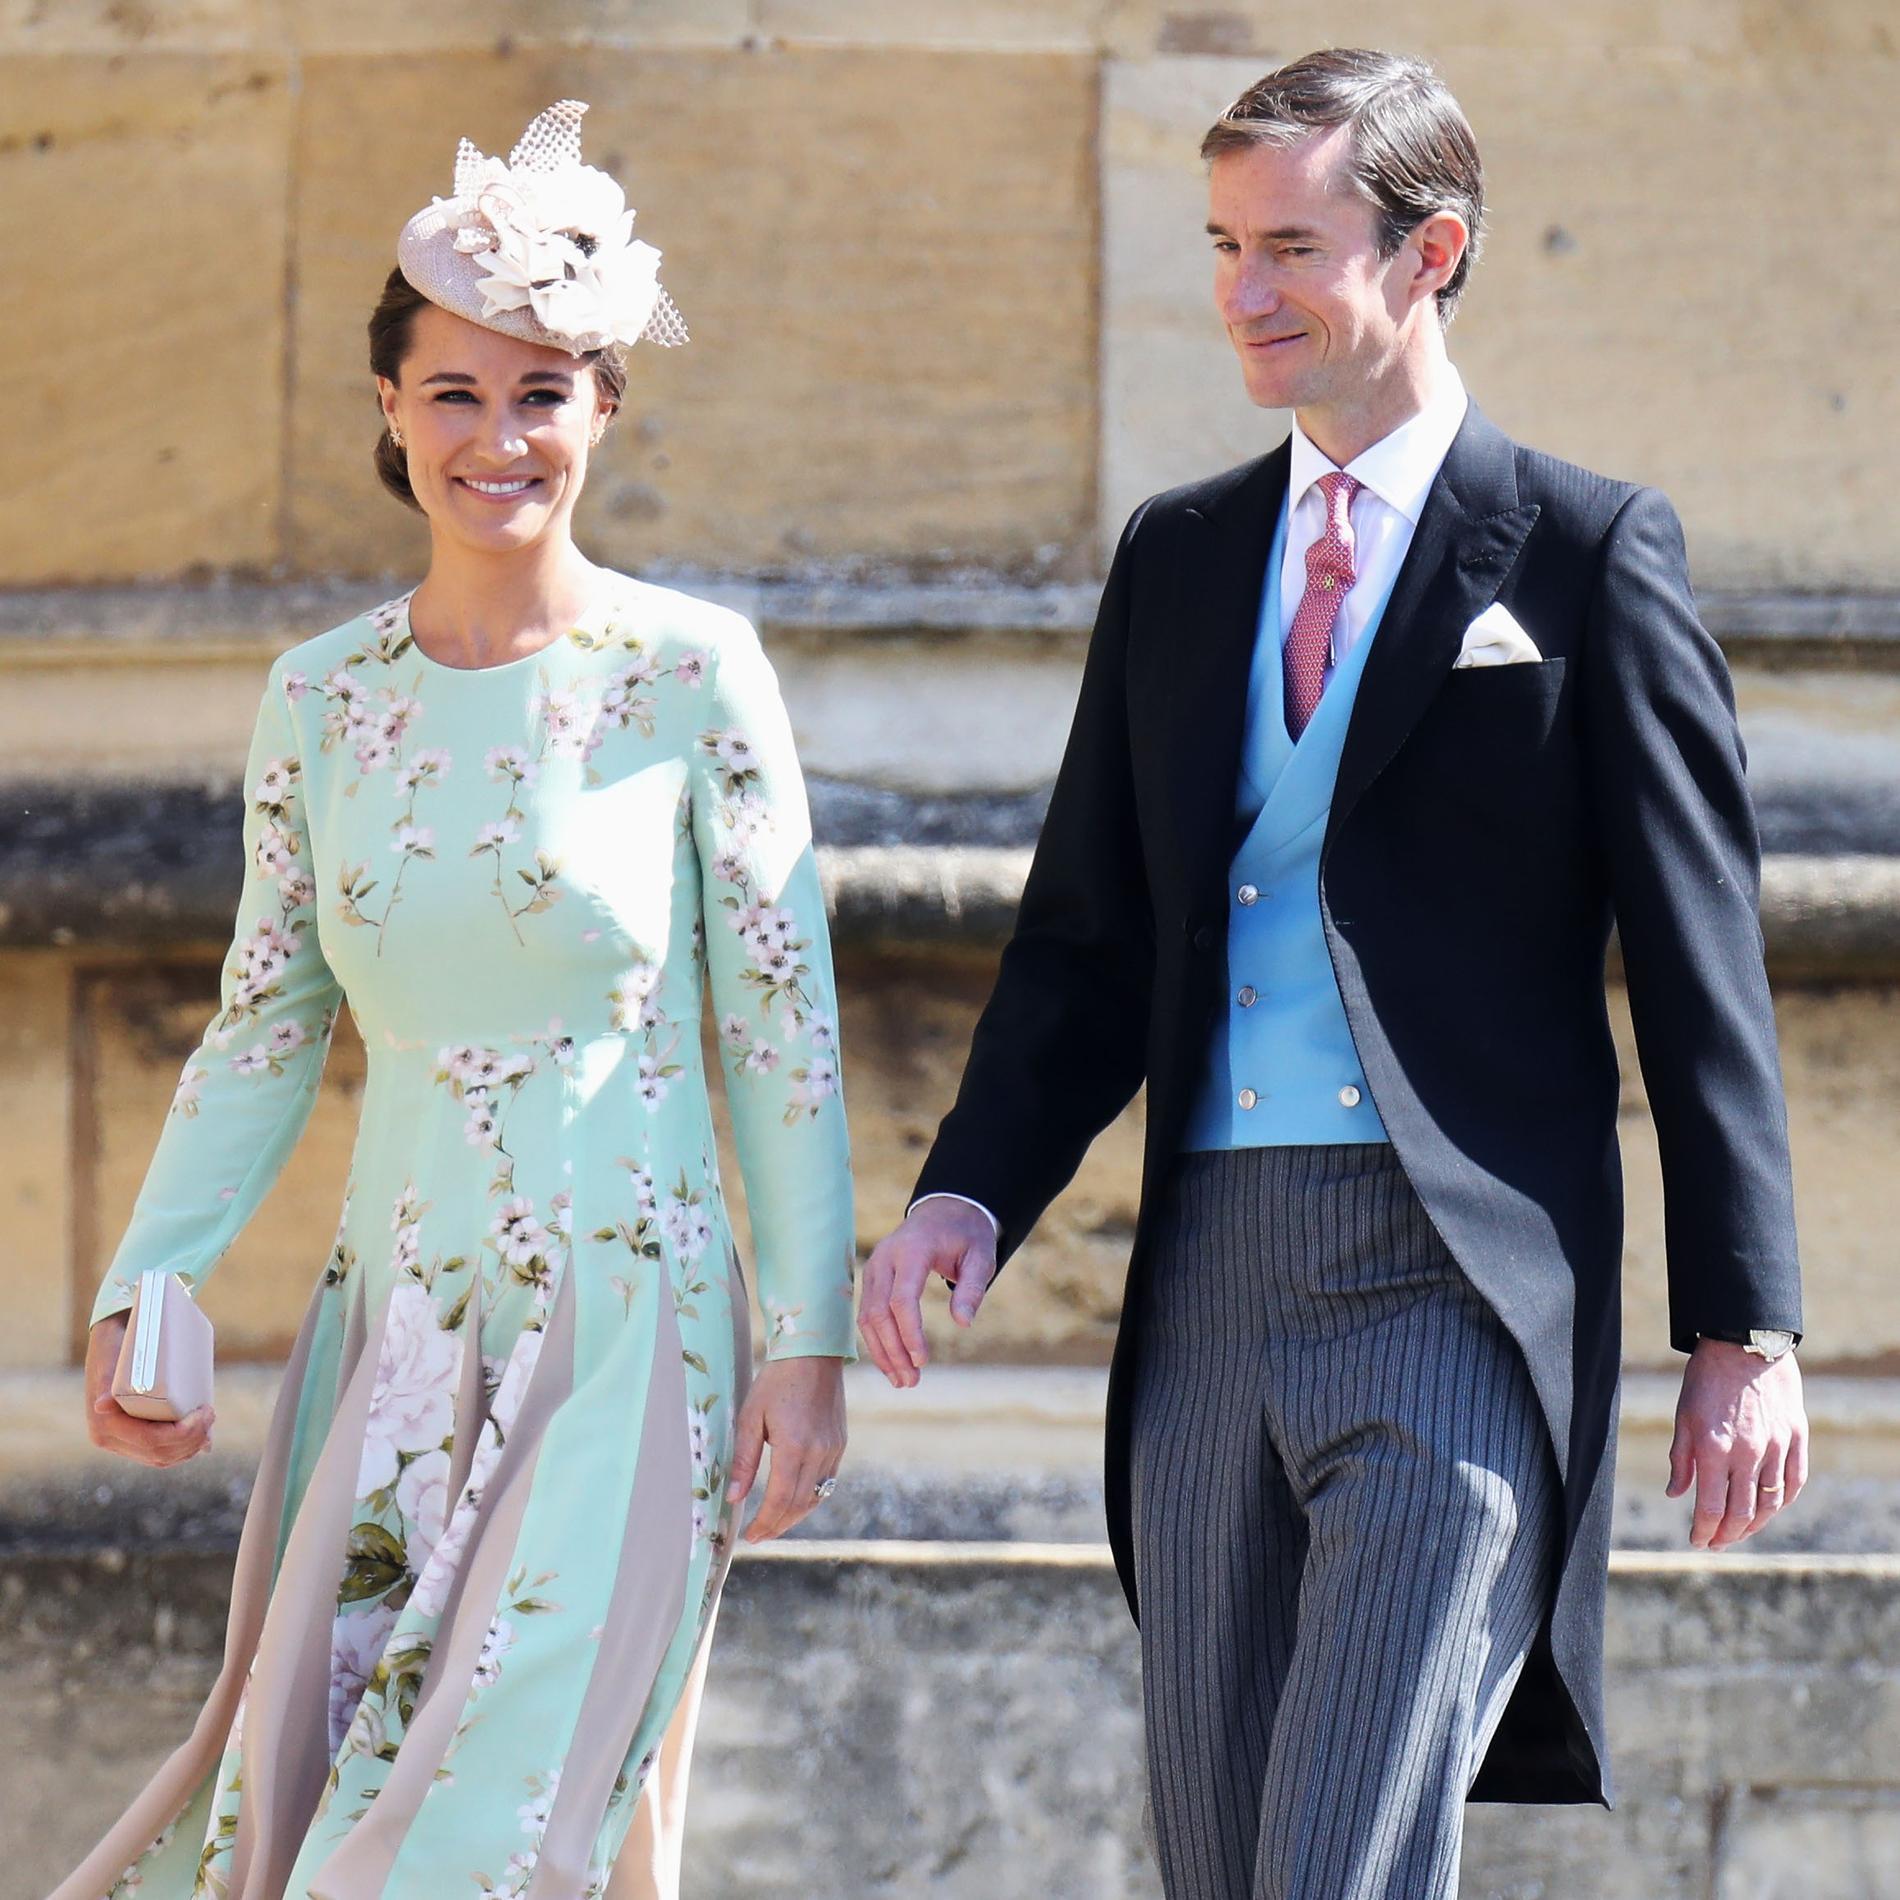 Match mode du mariage royal : Hollywood vs. noblesse britannique - Pippa Middleton